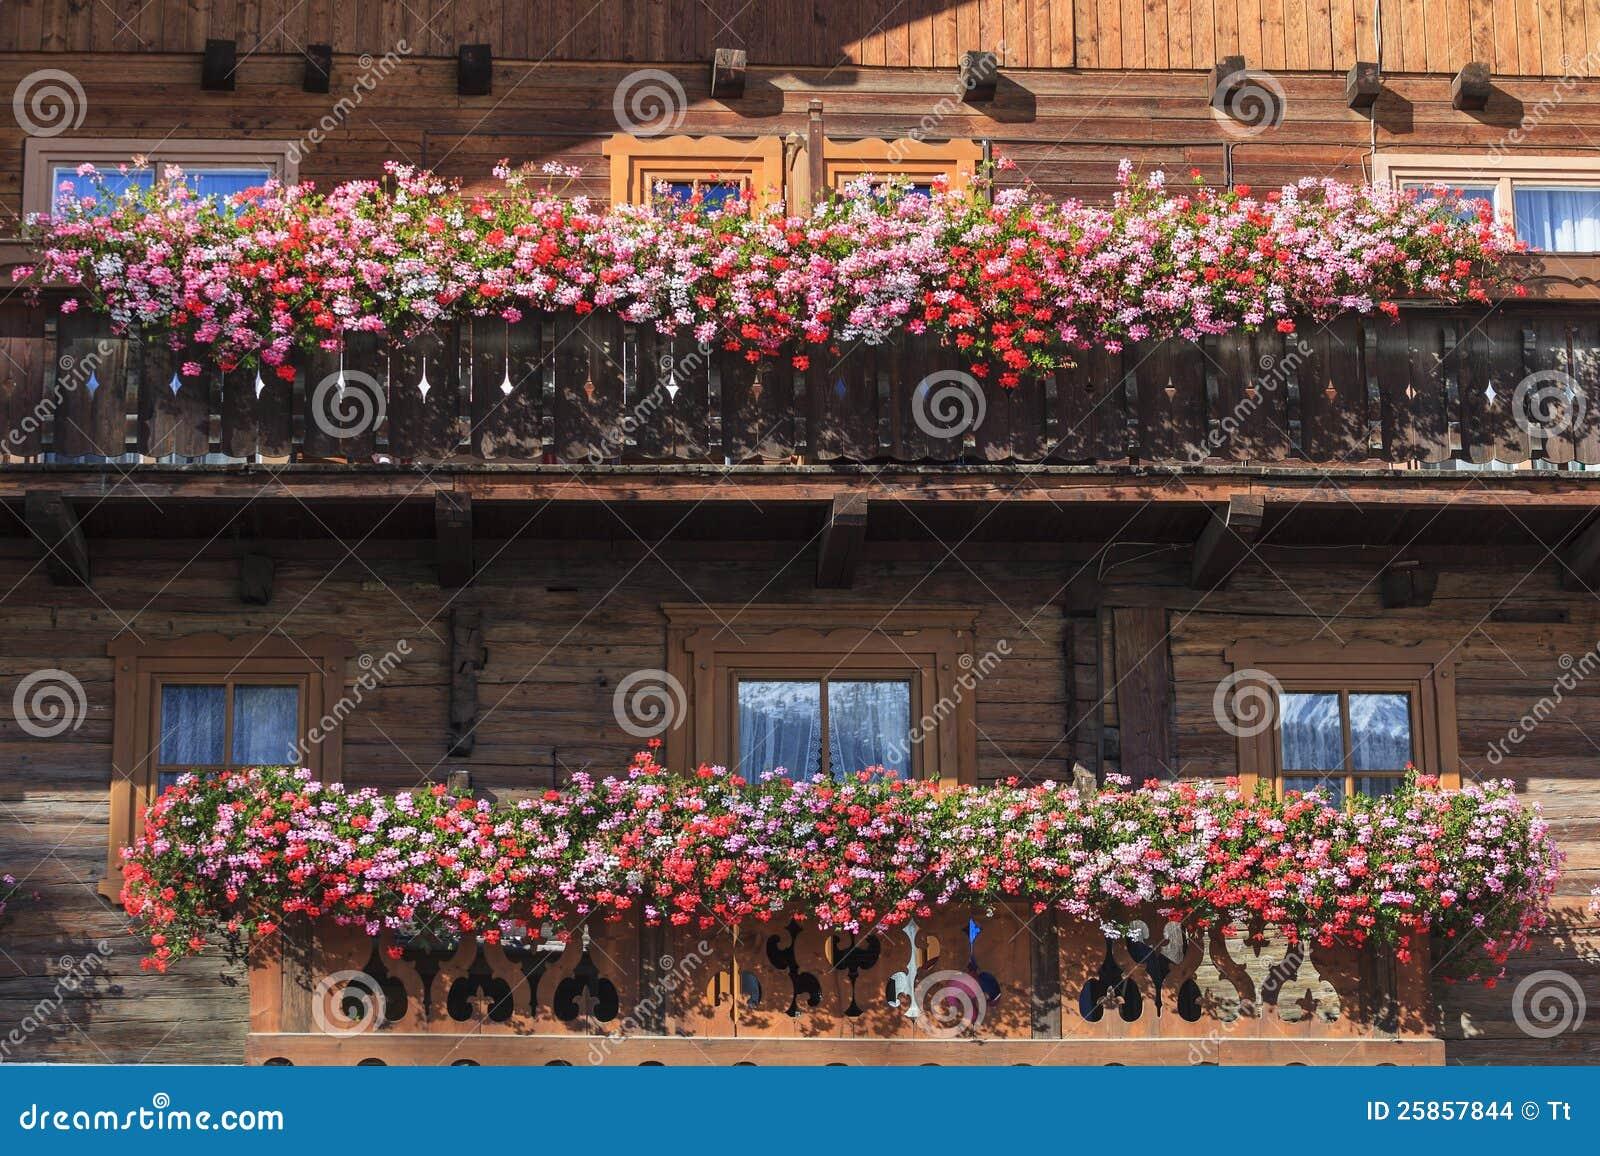 balkon mit blumenk sten stockbilder bild 25857844. Black Bedroom Furniture Sets. Home Design Ideas